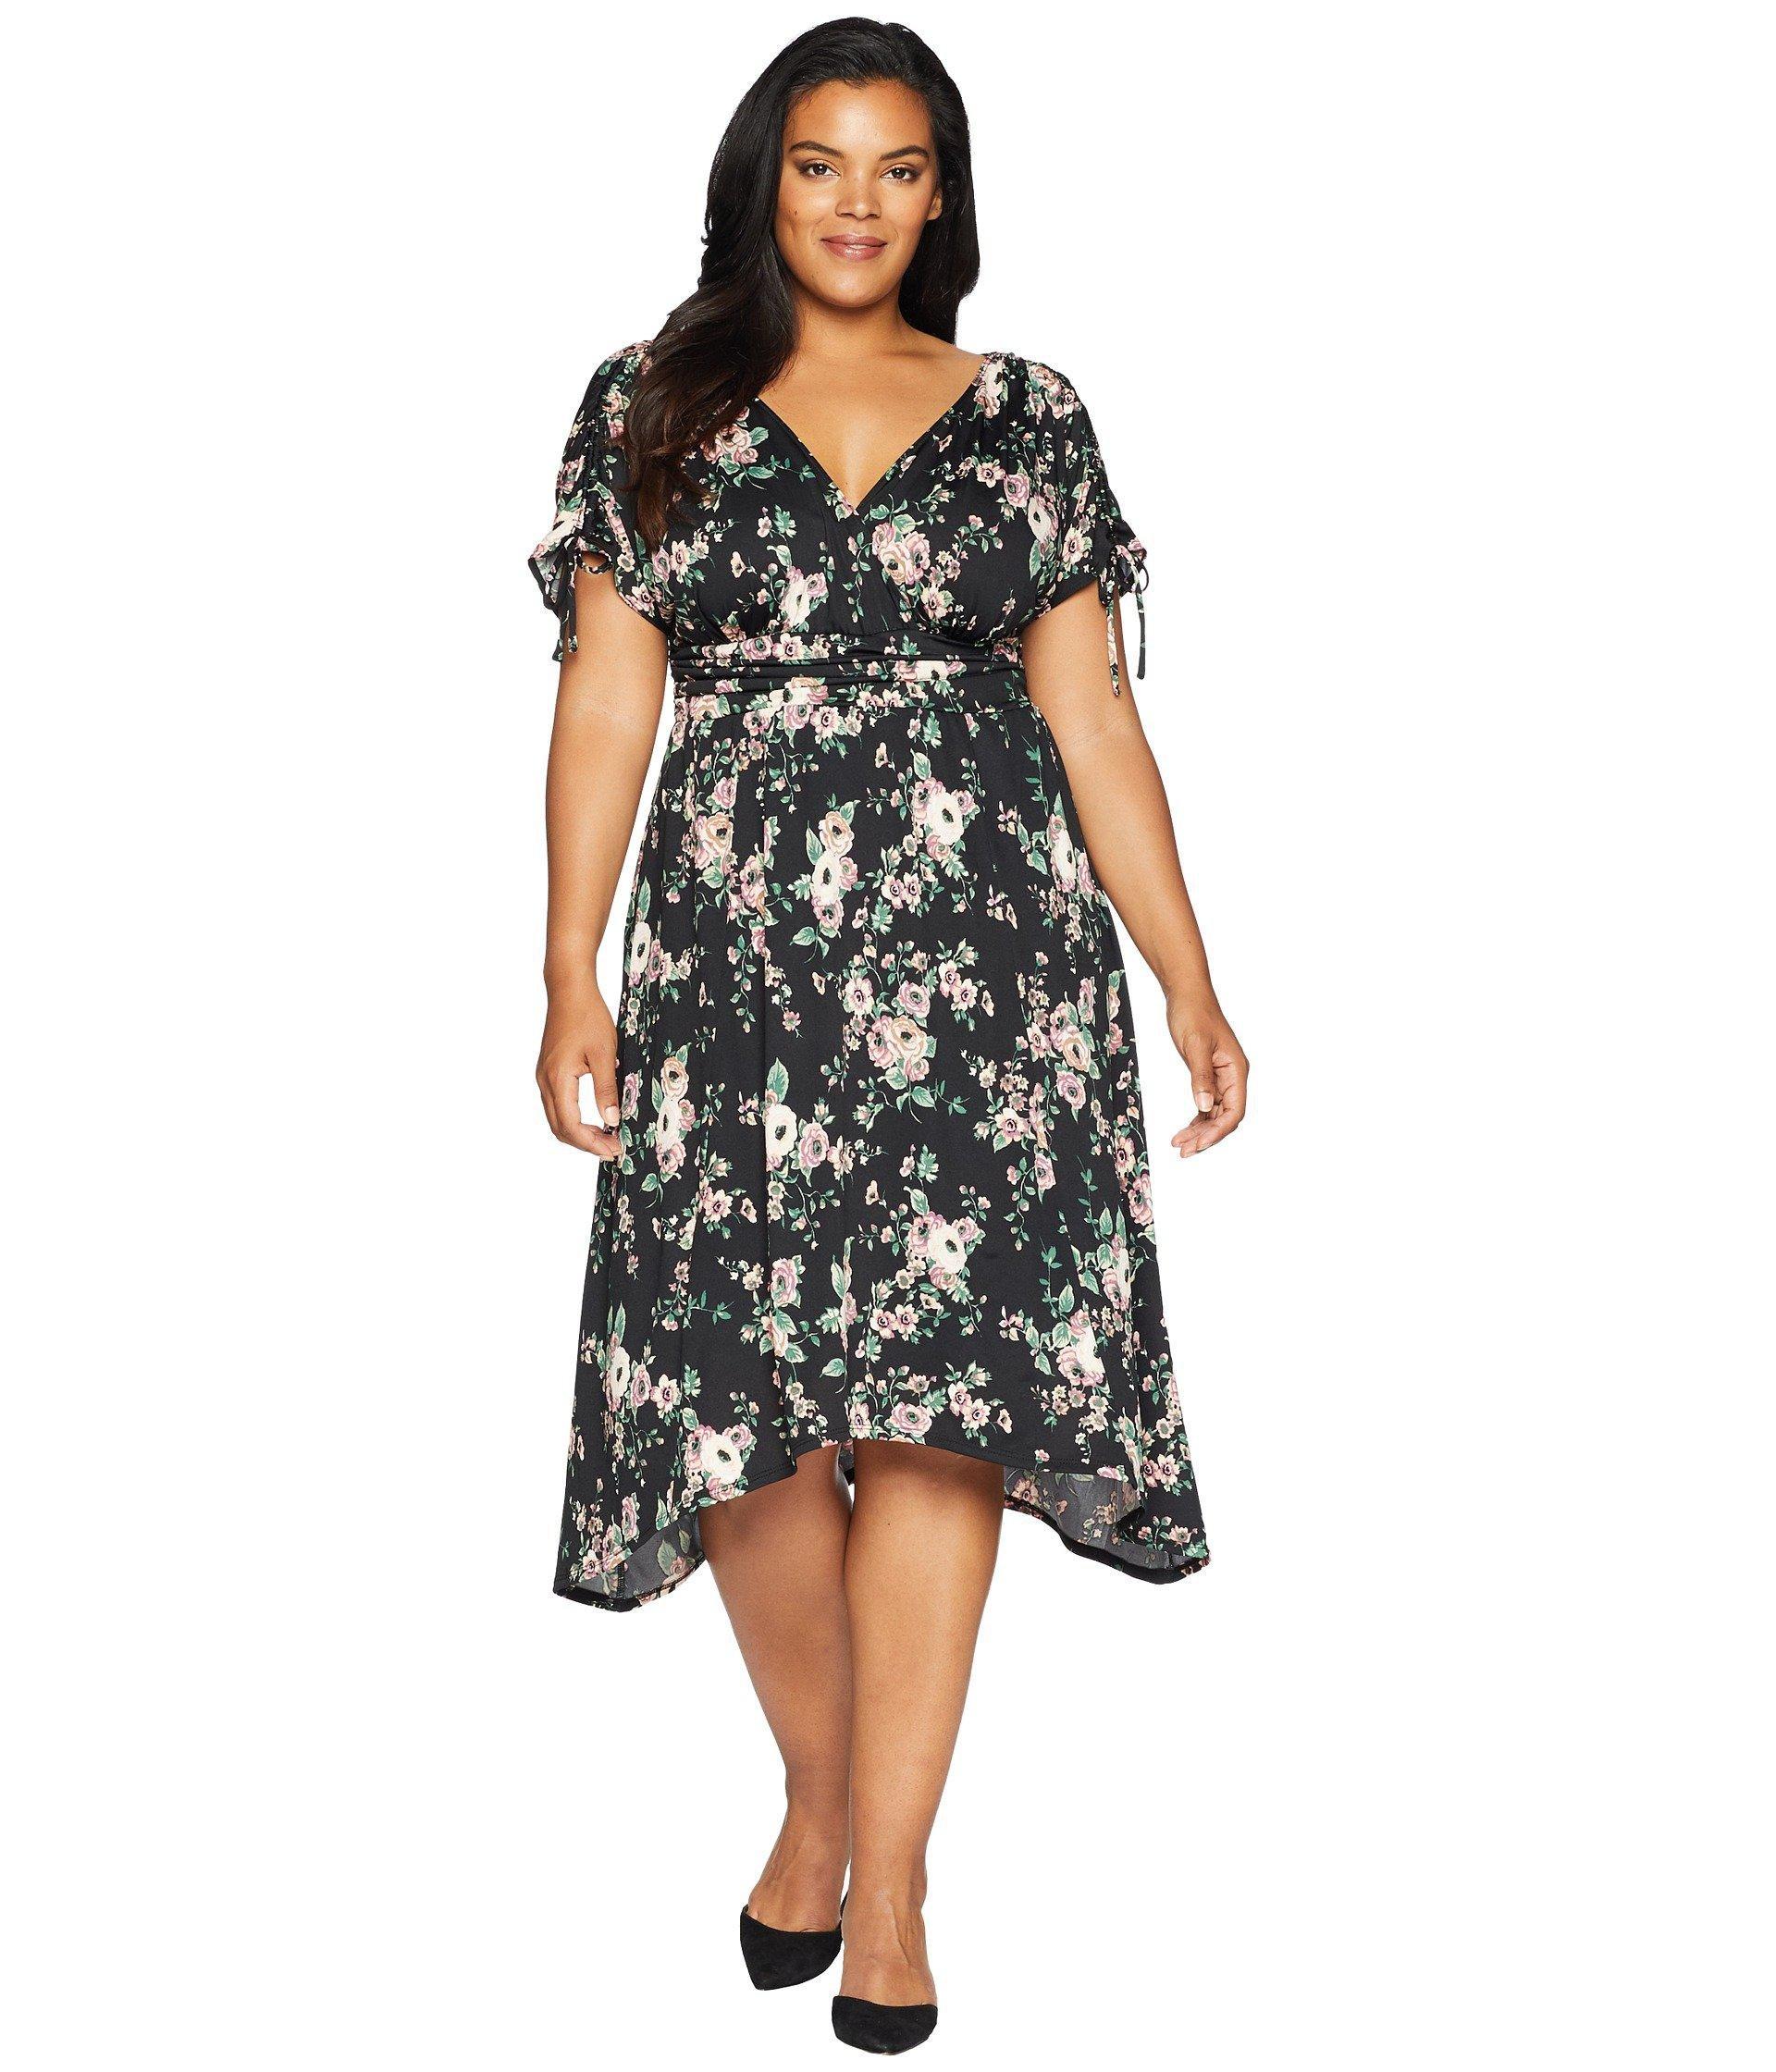 9fa56457dcc Lyst - Kiyonna Tessa Ruched Dress in Black